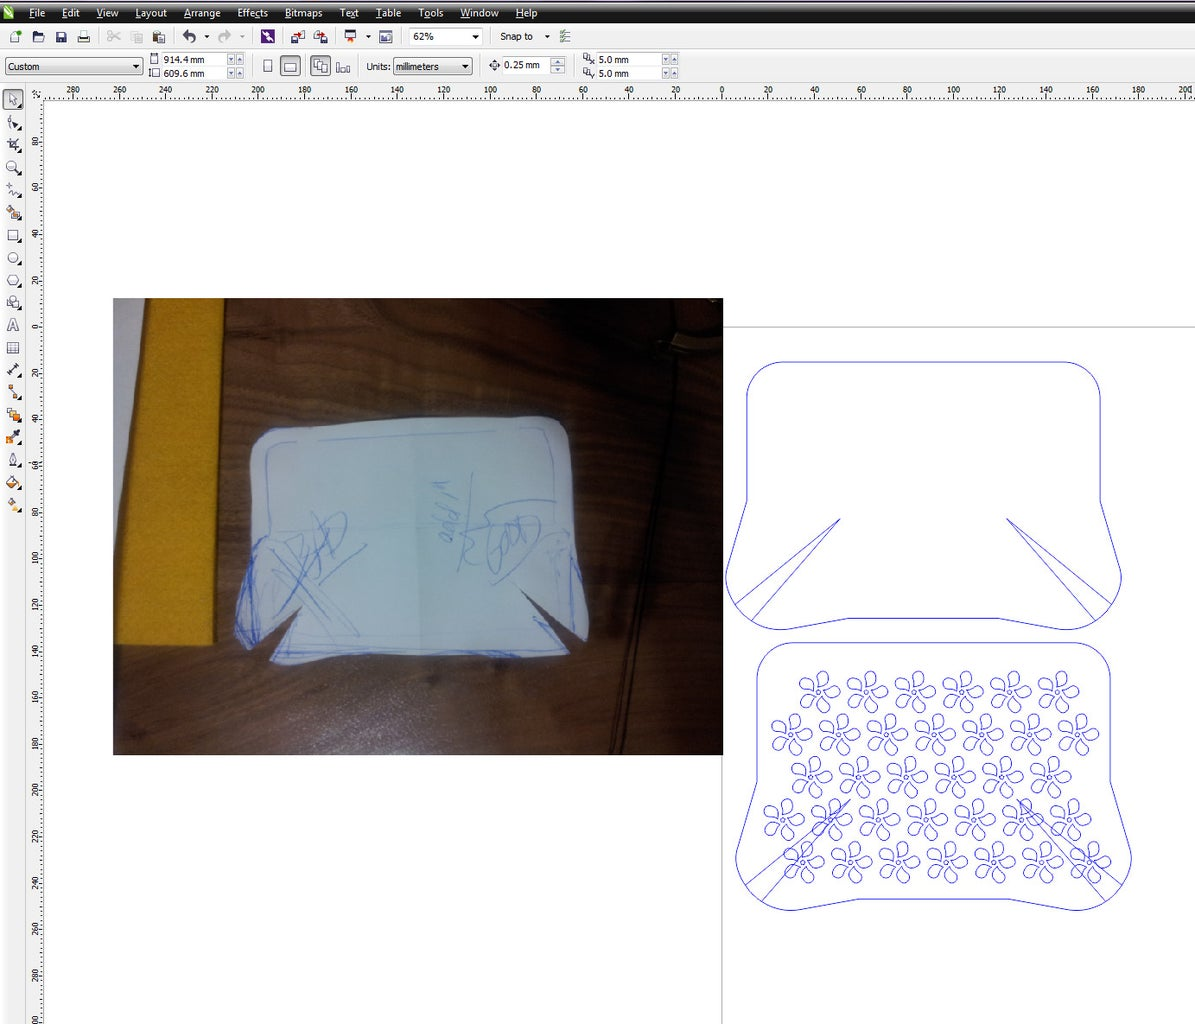 Digitizing the Pattern